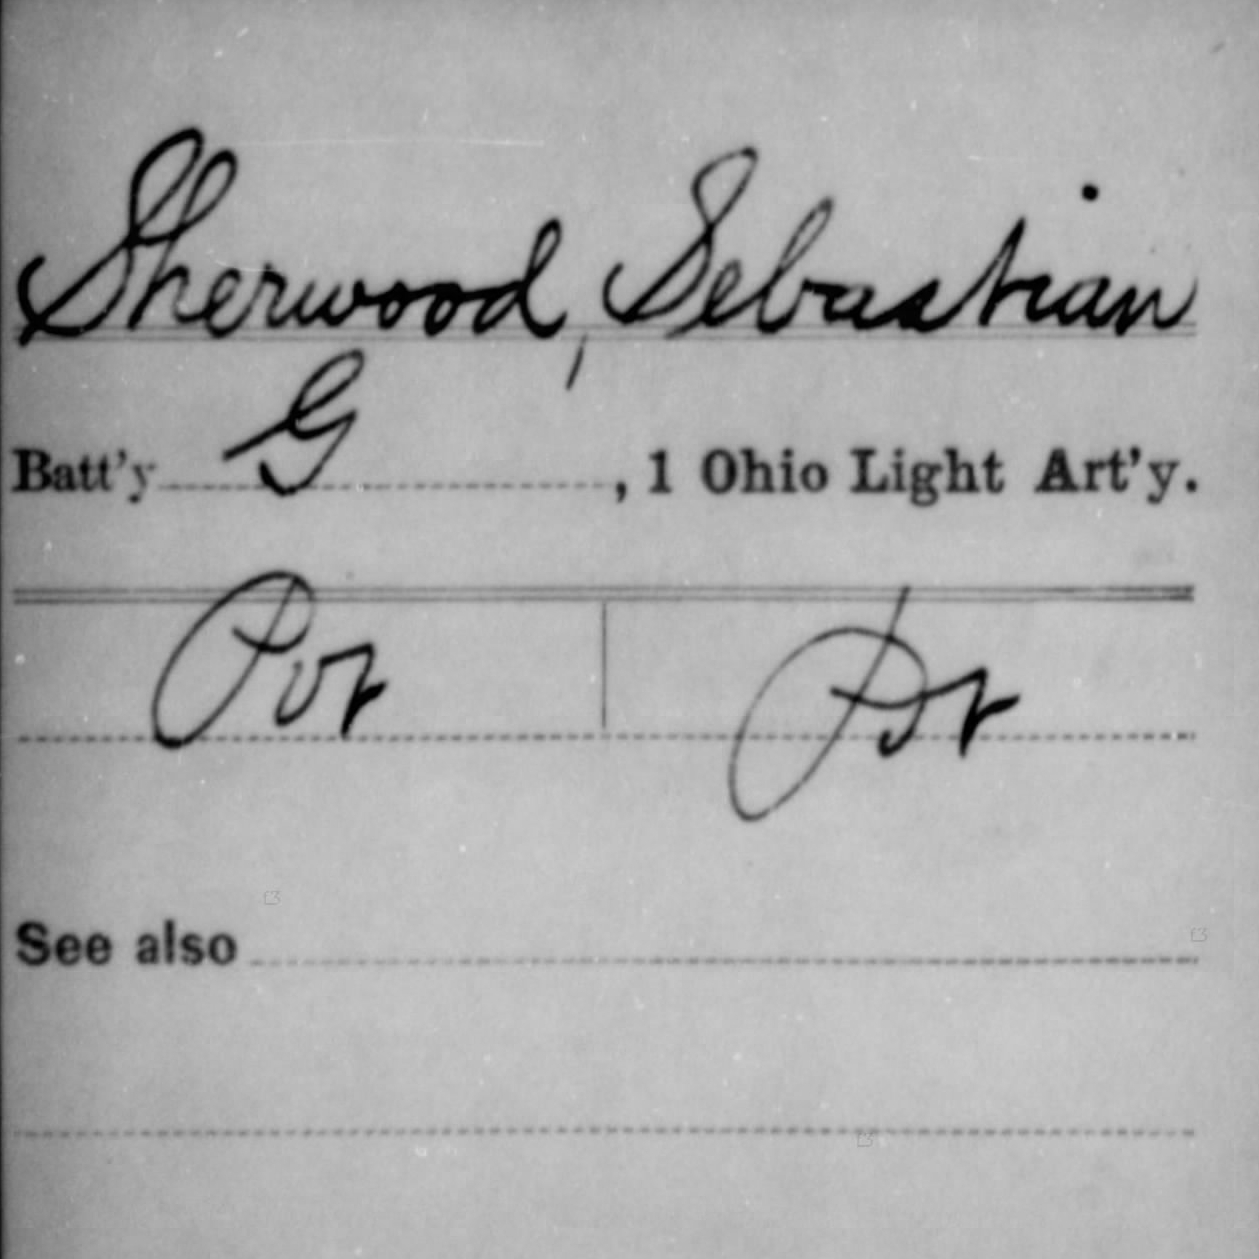 Pvt. Sebastian Sherwood, Battery G, 1st OH Light Artillery, USA